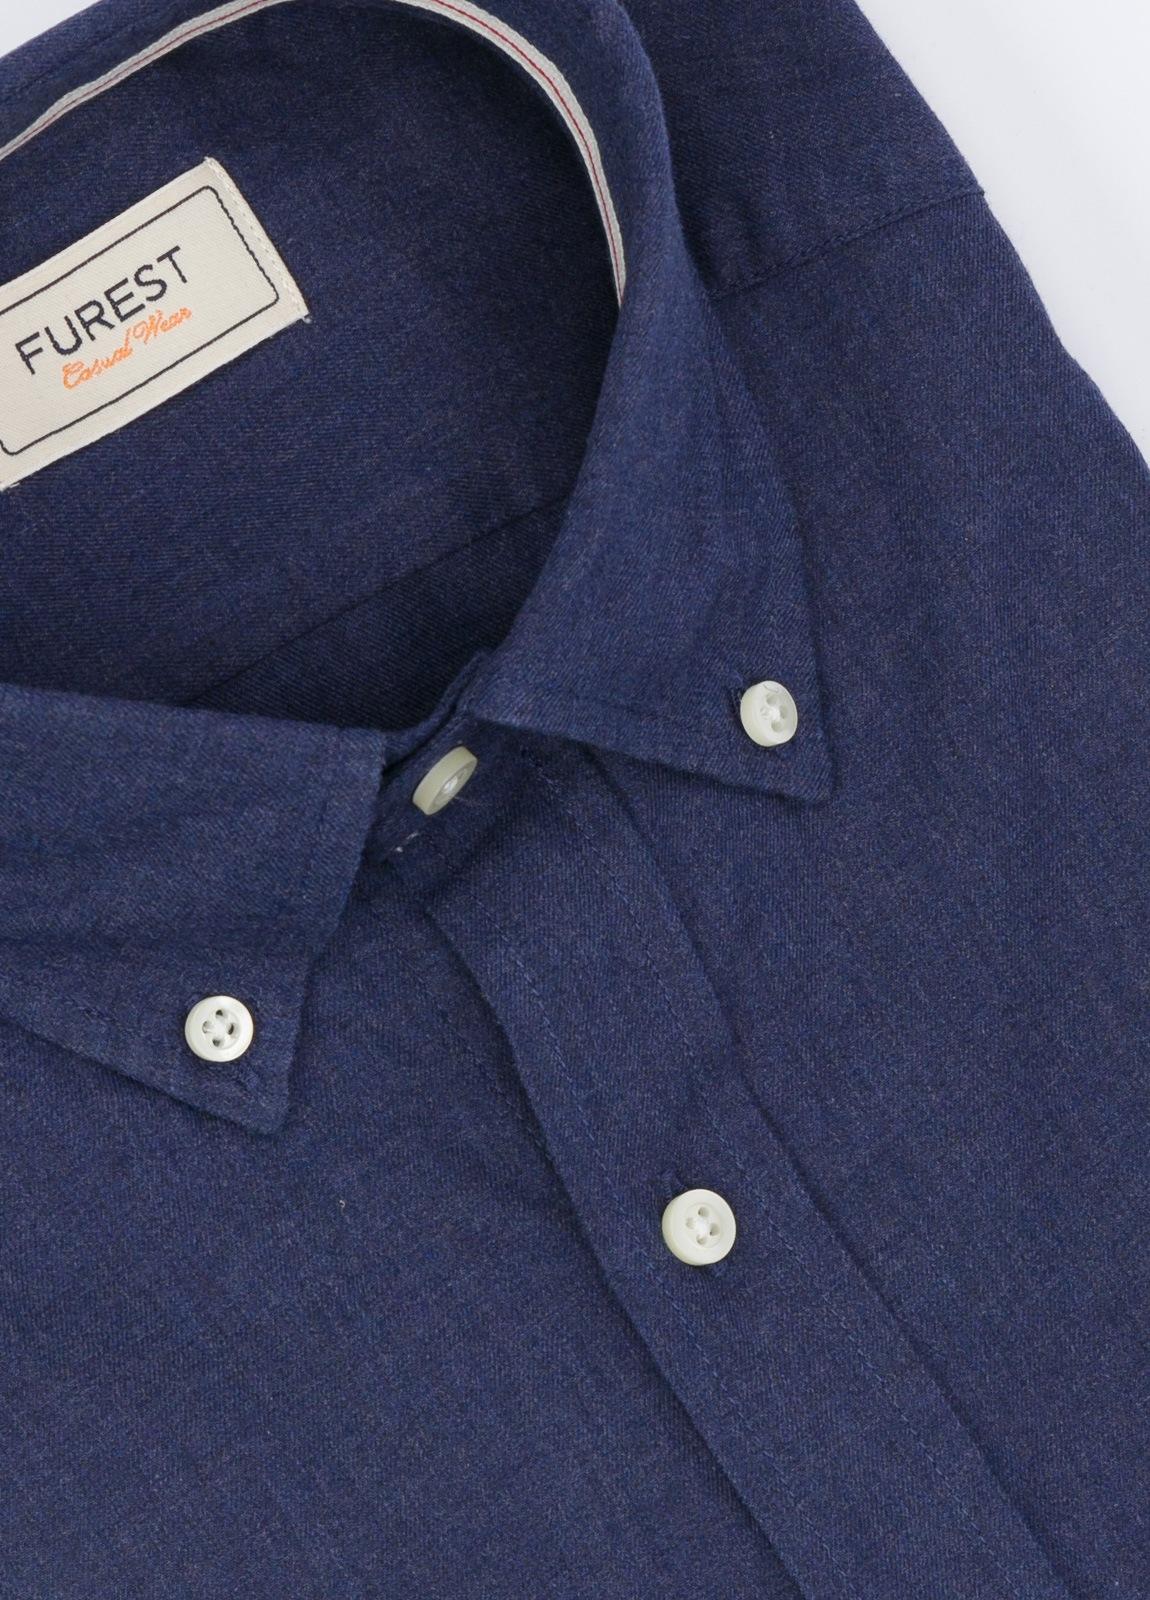 Camisa Leisure Wear SLIM Botón Down, color azul noche. 100% Algodón. - Ítem1